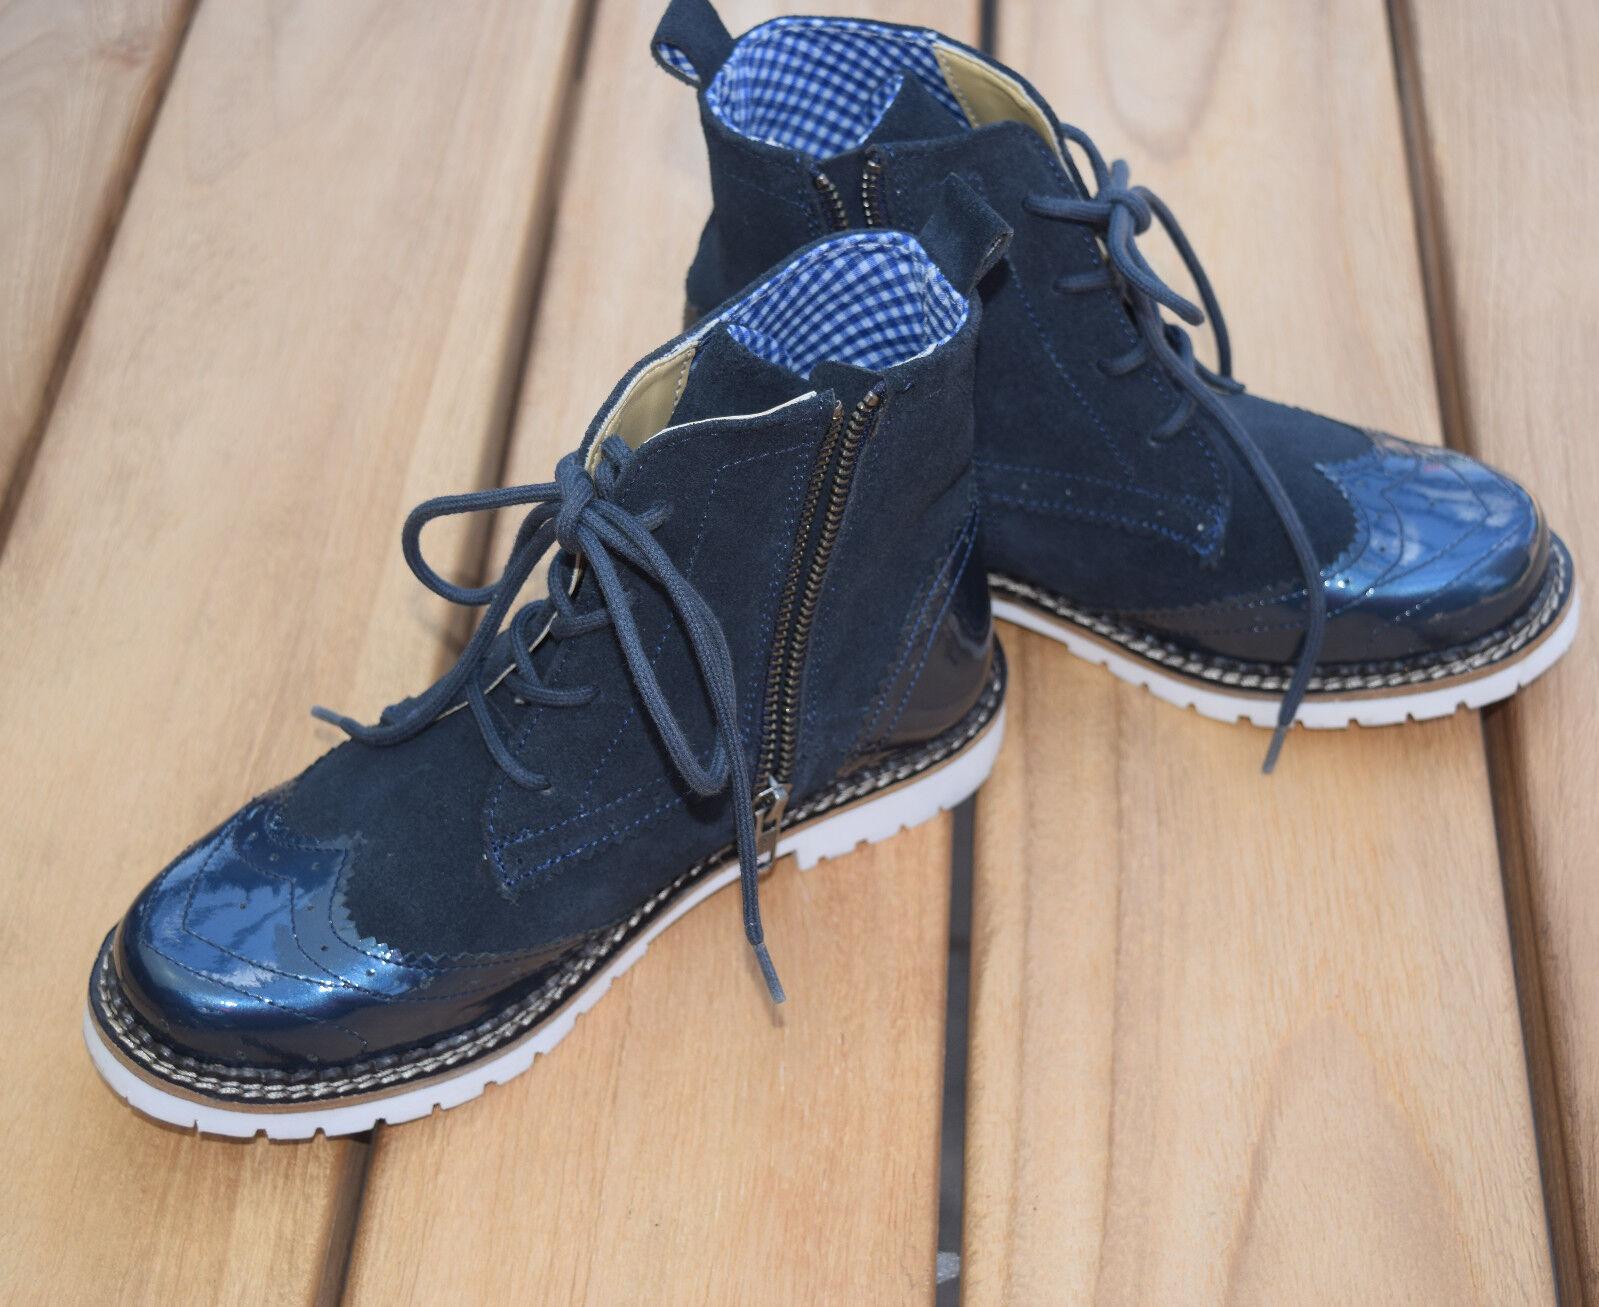 Spieth Wensky Trachtenschuhe Damen Jelka Stiefel Lack Crosta Navy Blau Wiesn Oktob